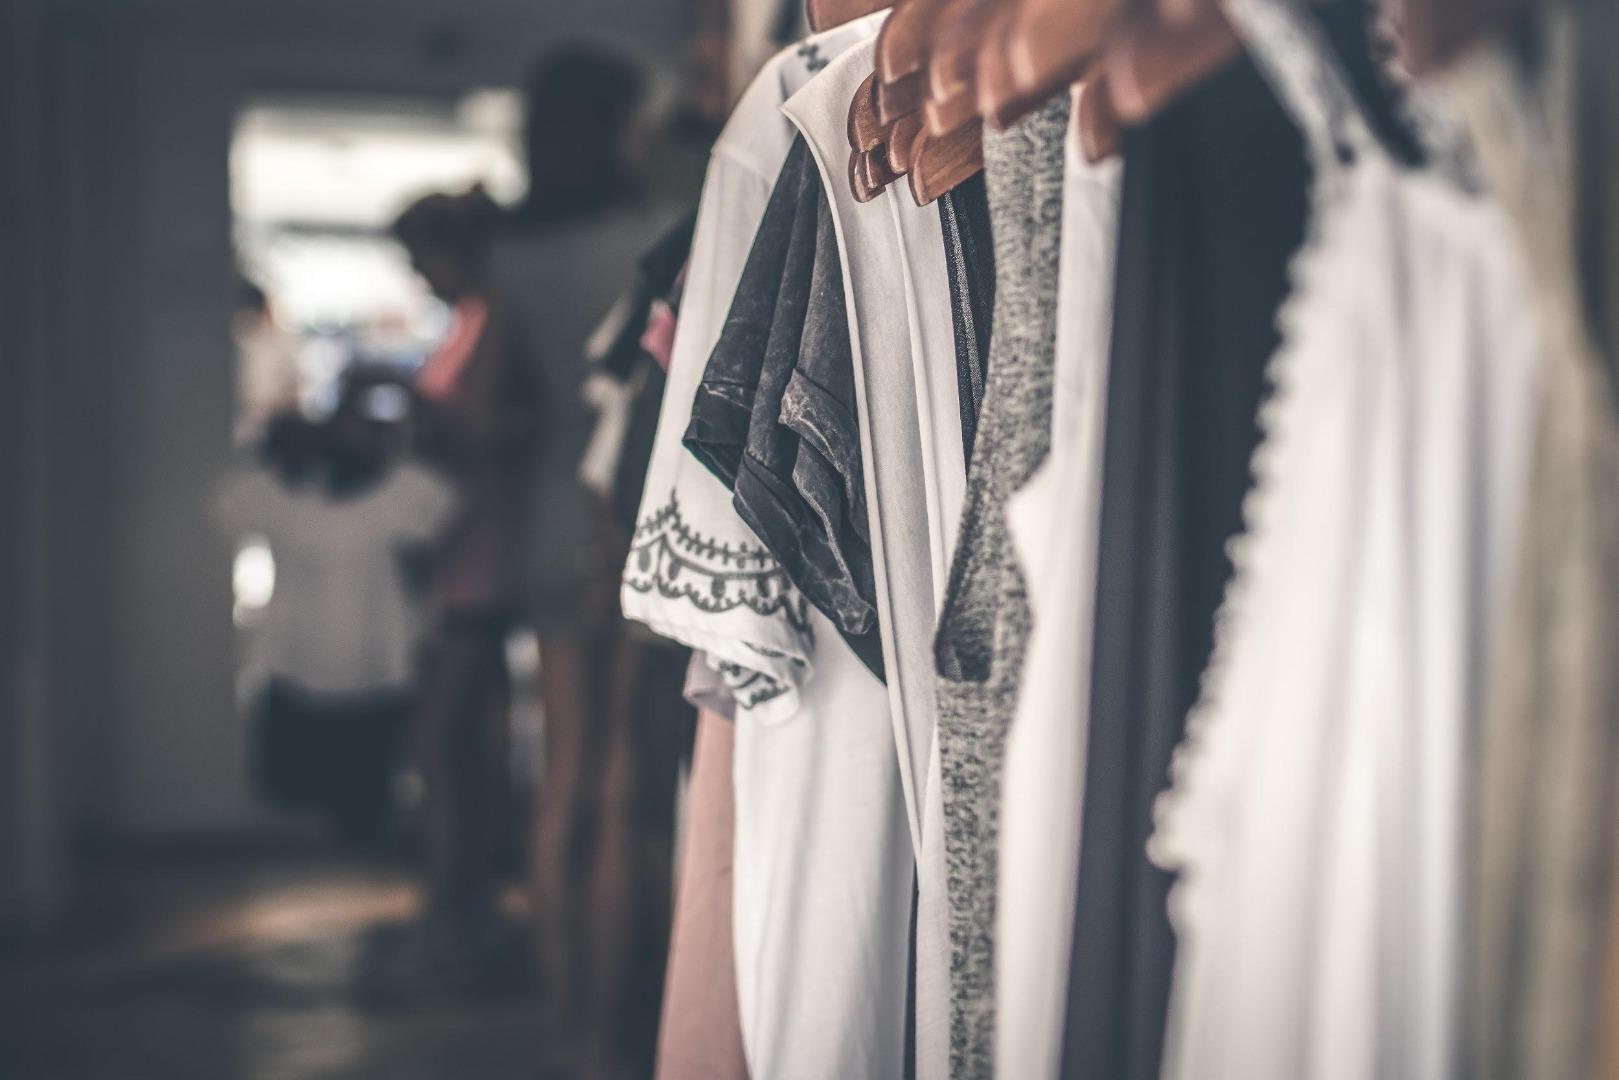 turkish clothes wholesale